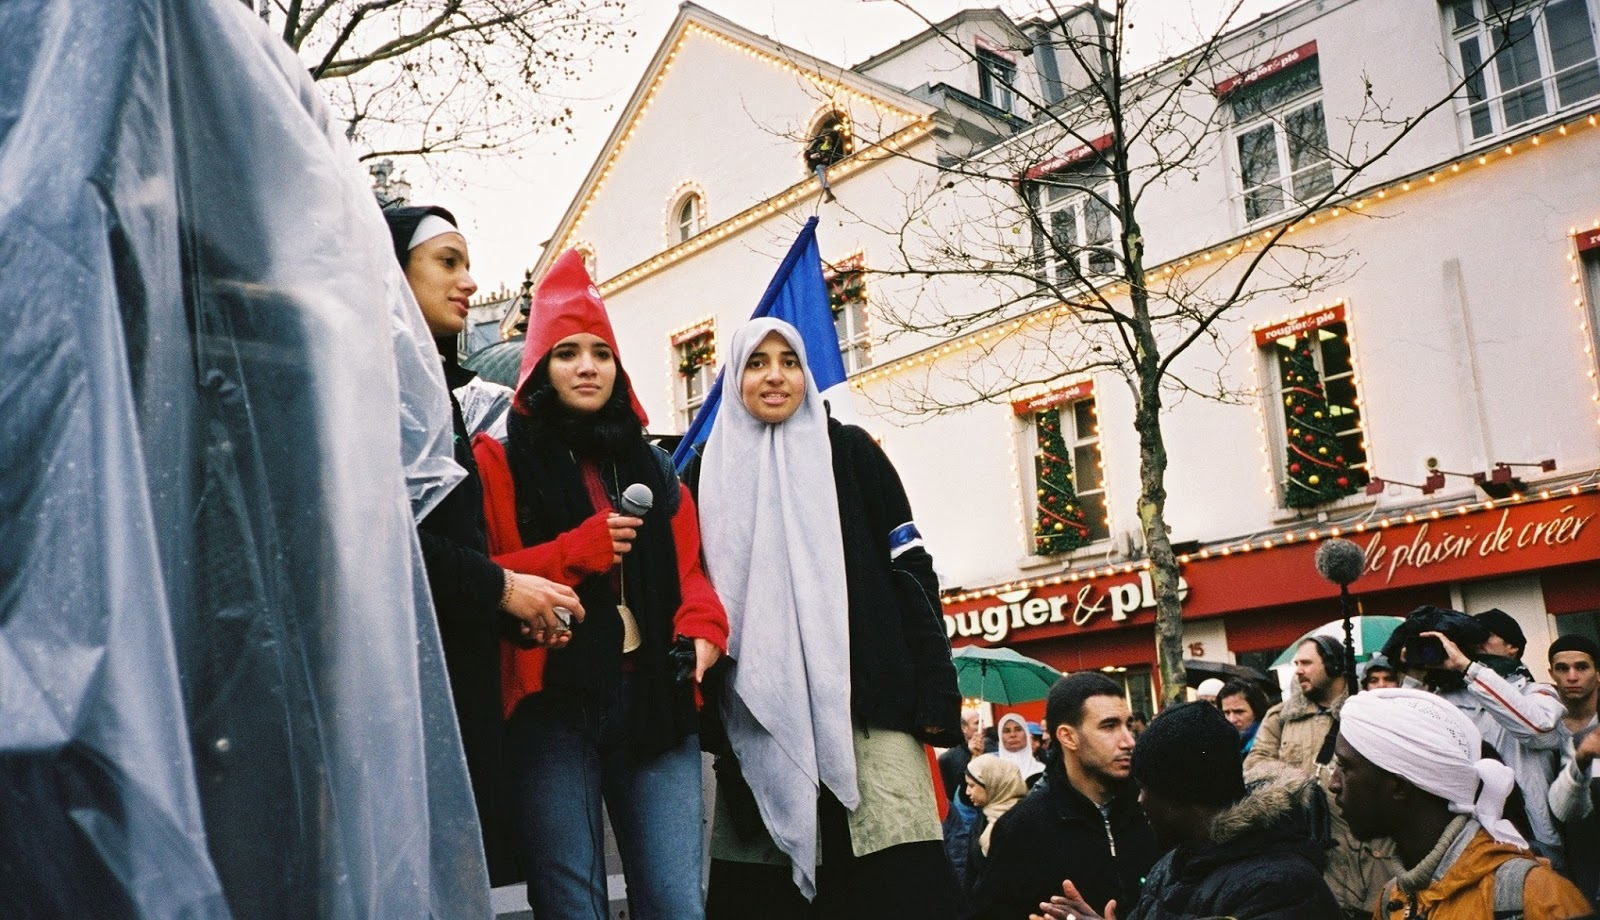 Snapsex, Rencontre Sexe Plan Plumetot Les Spectacles Club Libertin 87